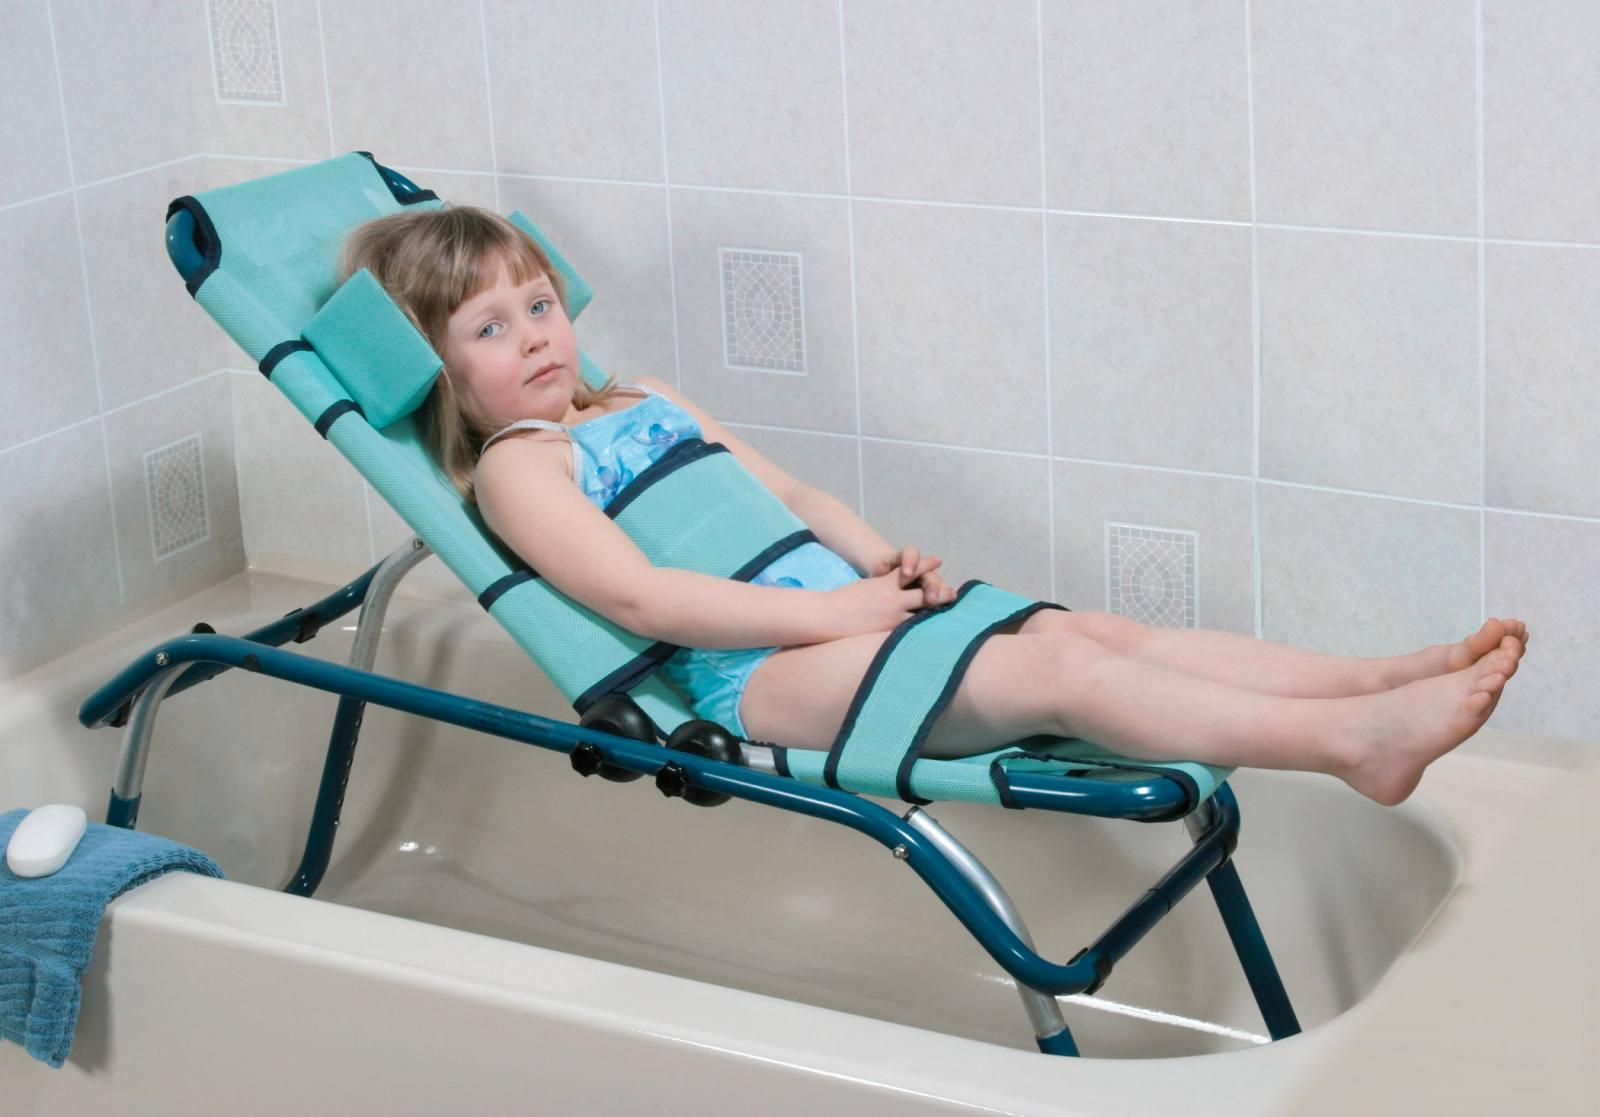 Dolphin Bath Chair Adjustable Base for sale | Wellness Medical ...